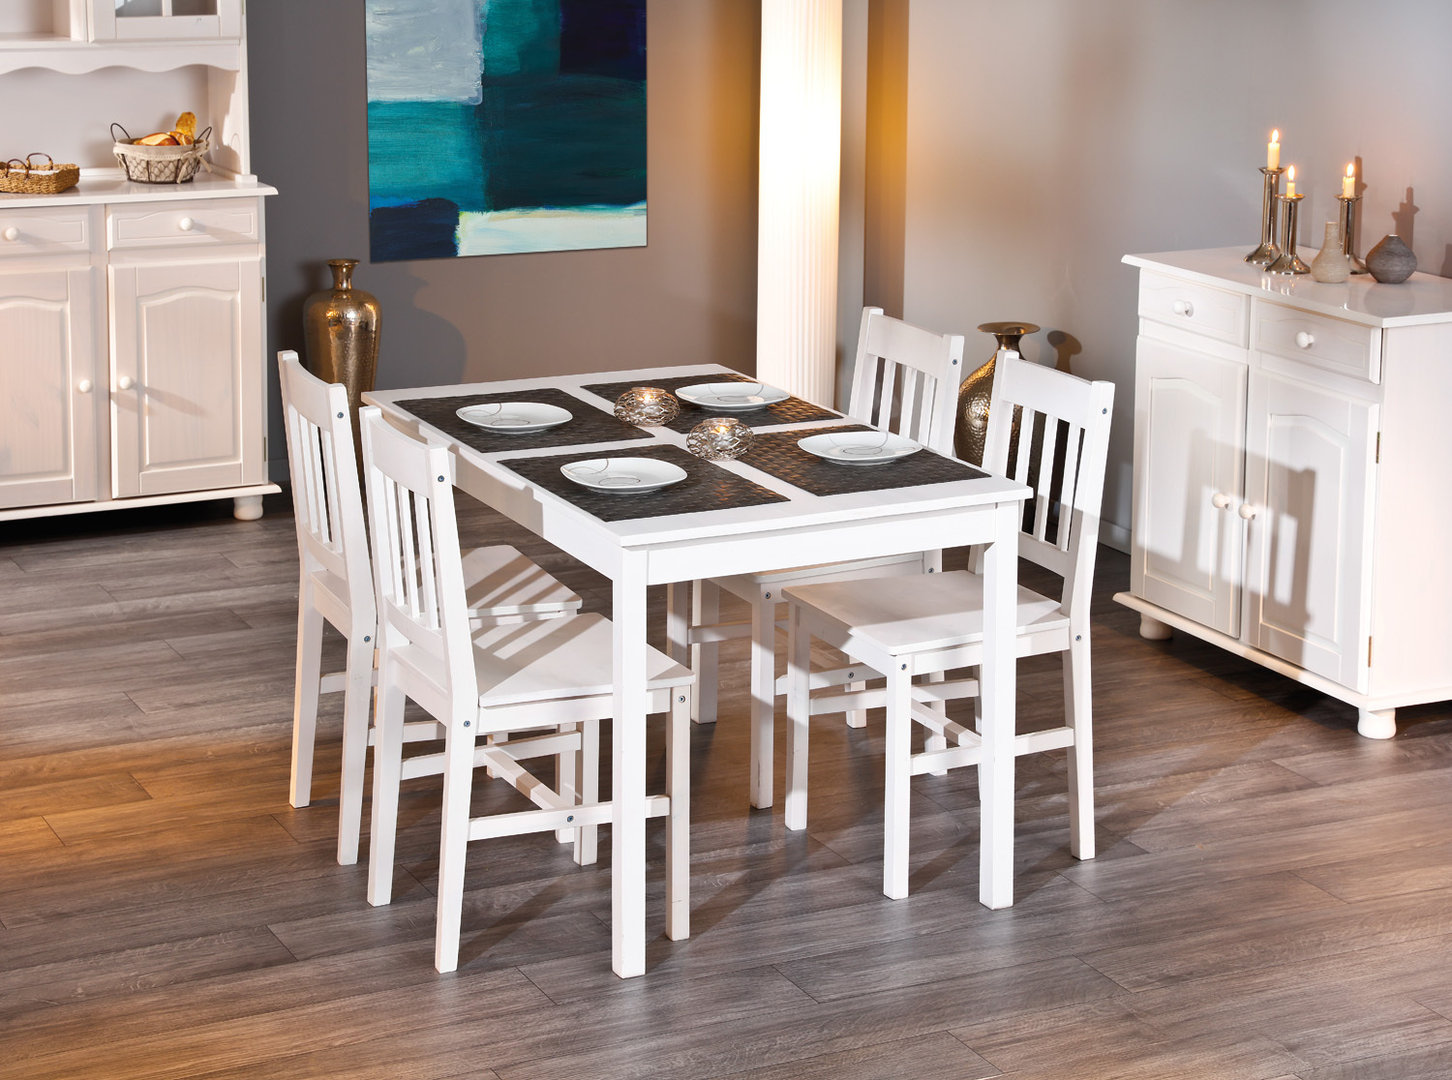 Due sedie Diva 67, sedia bianca moderna in legno, mobile cucina